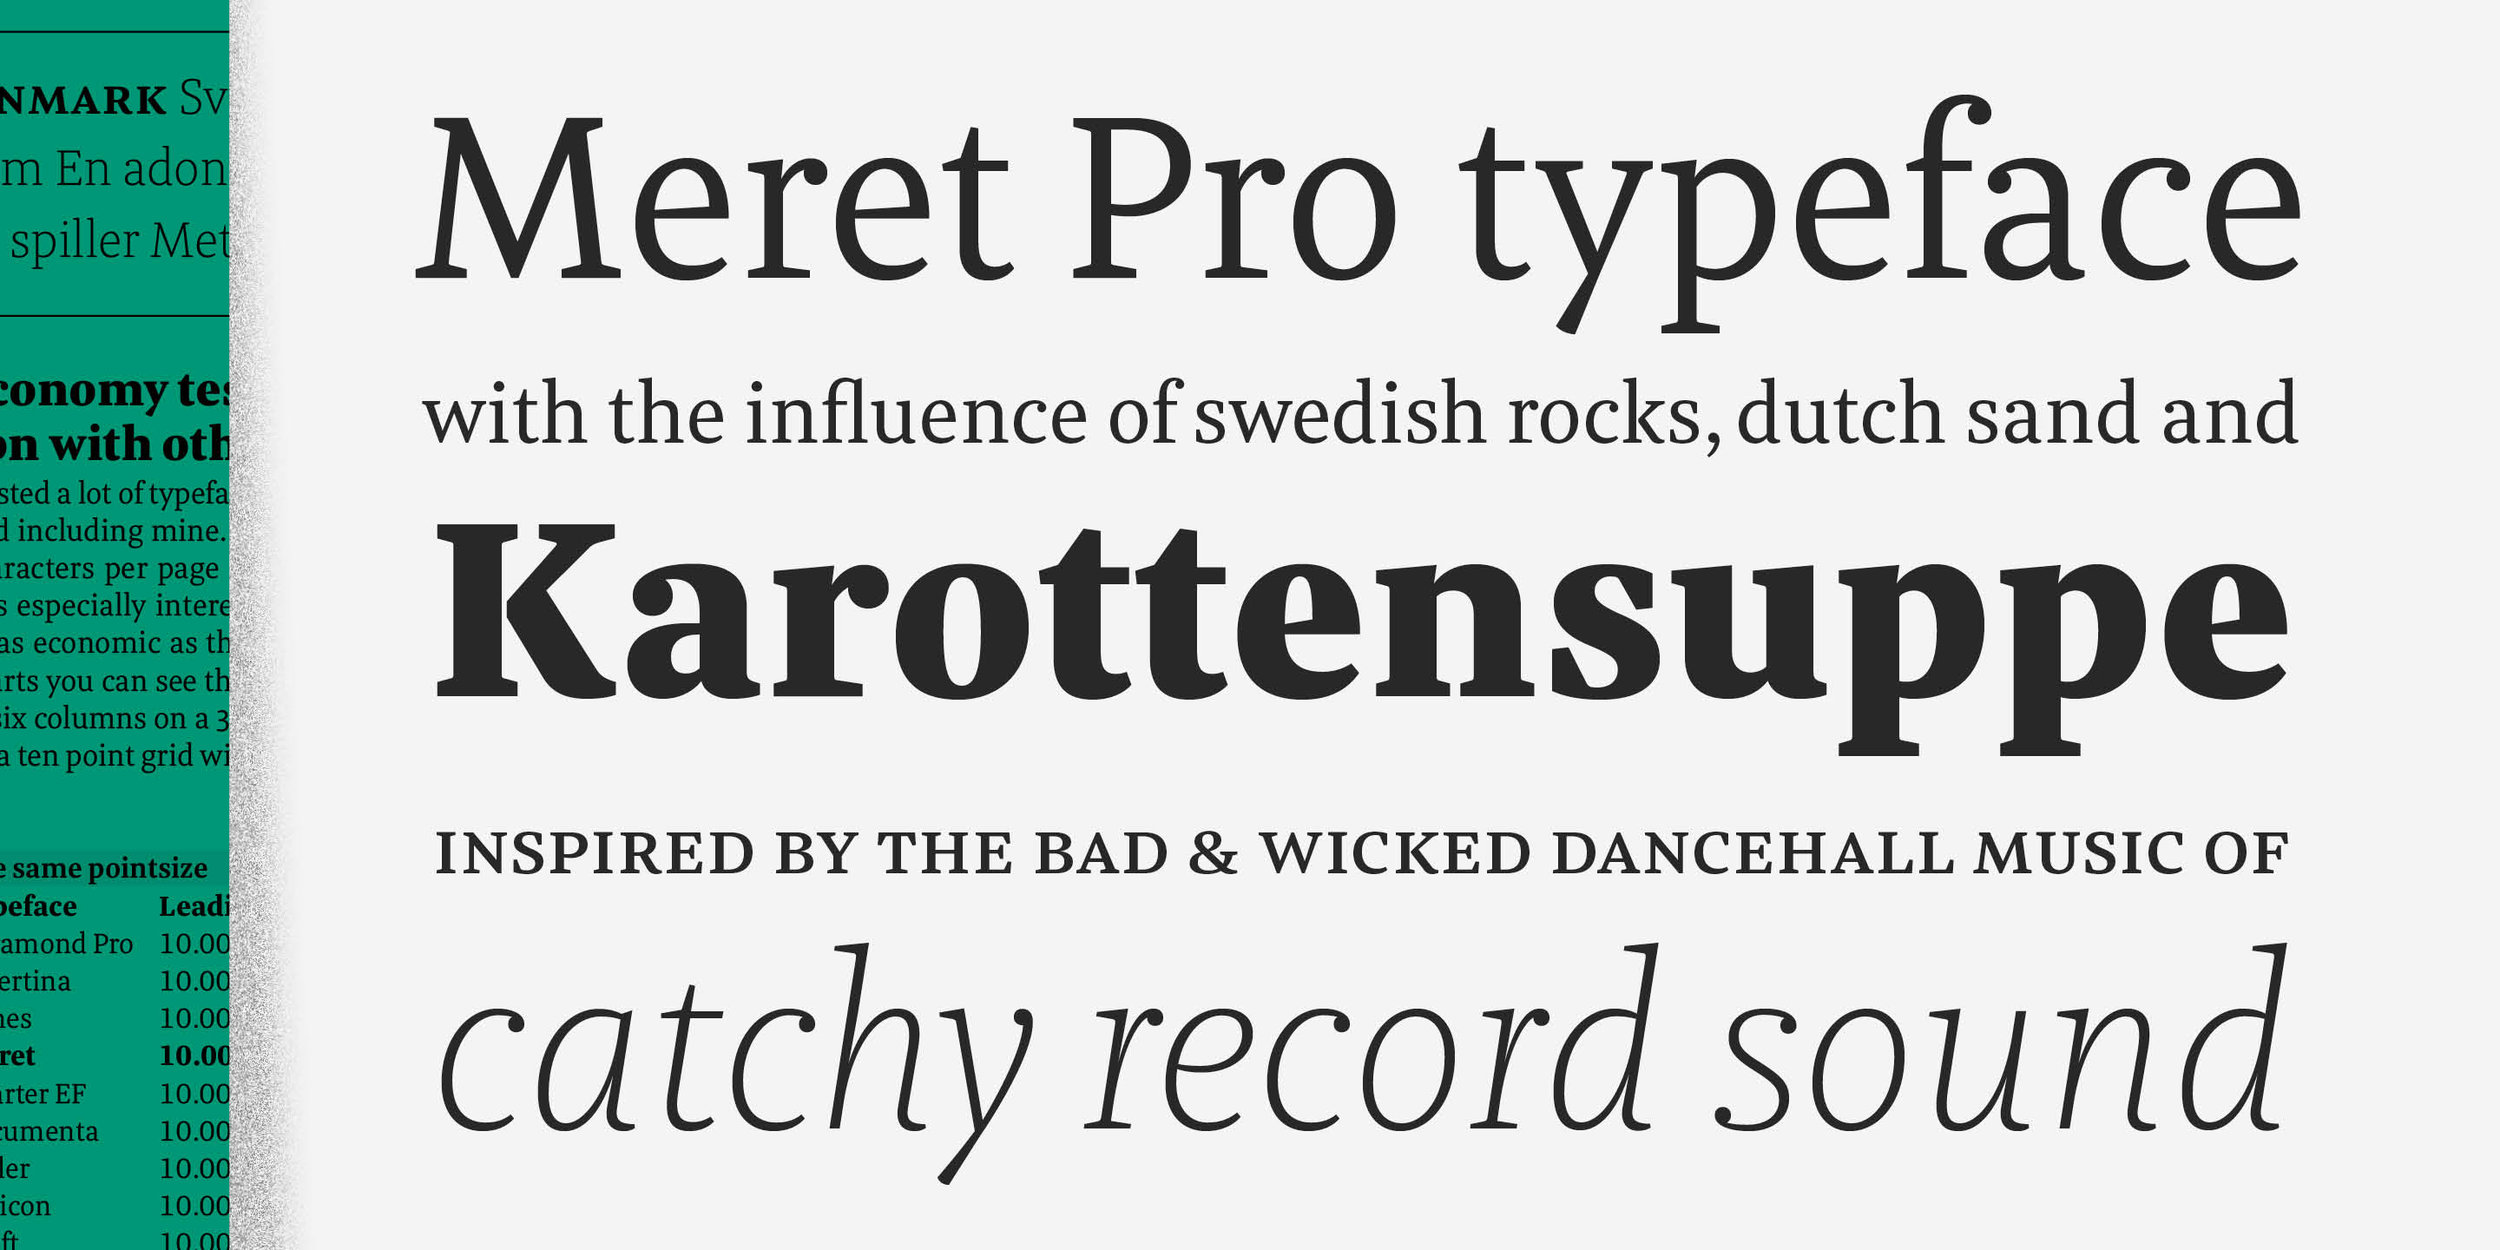 MeretPro-TypeMates-newspaper-editorial-typeface-font-2018-3.jpg